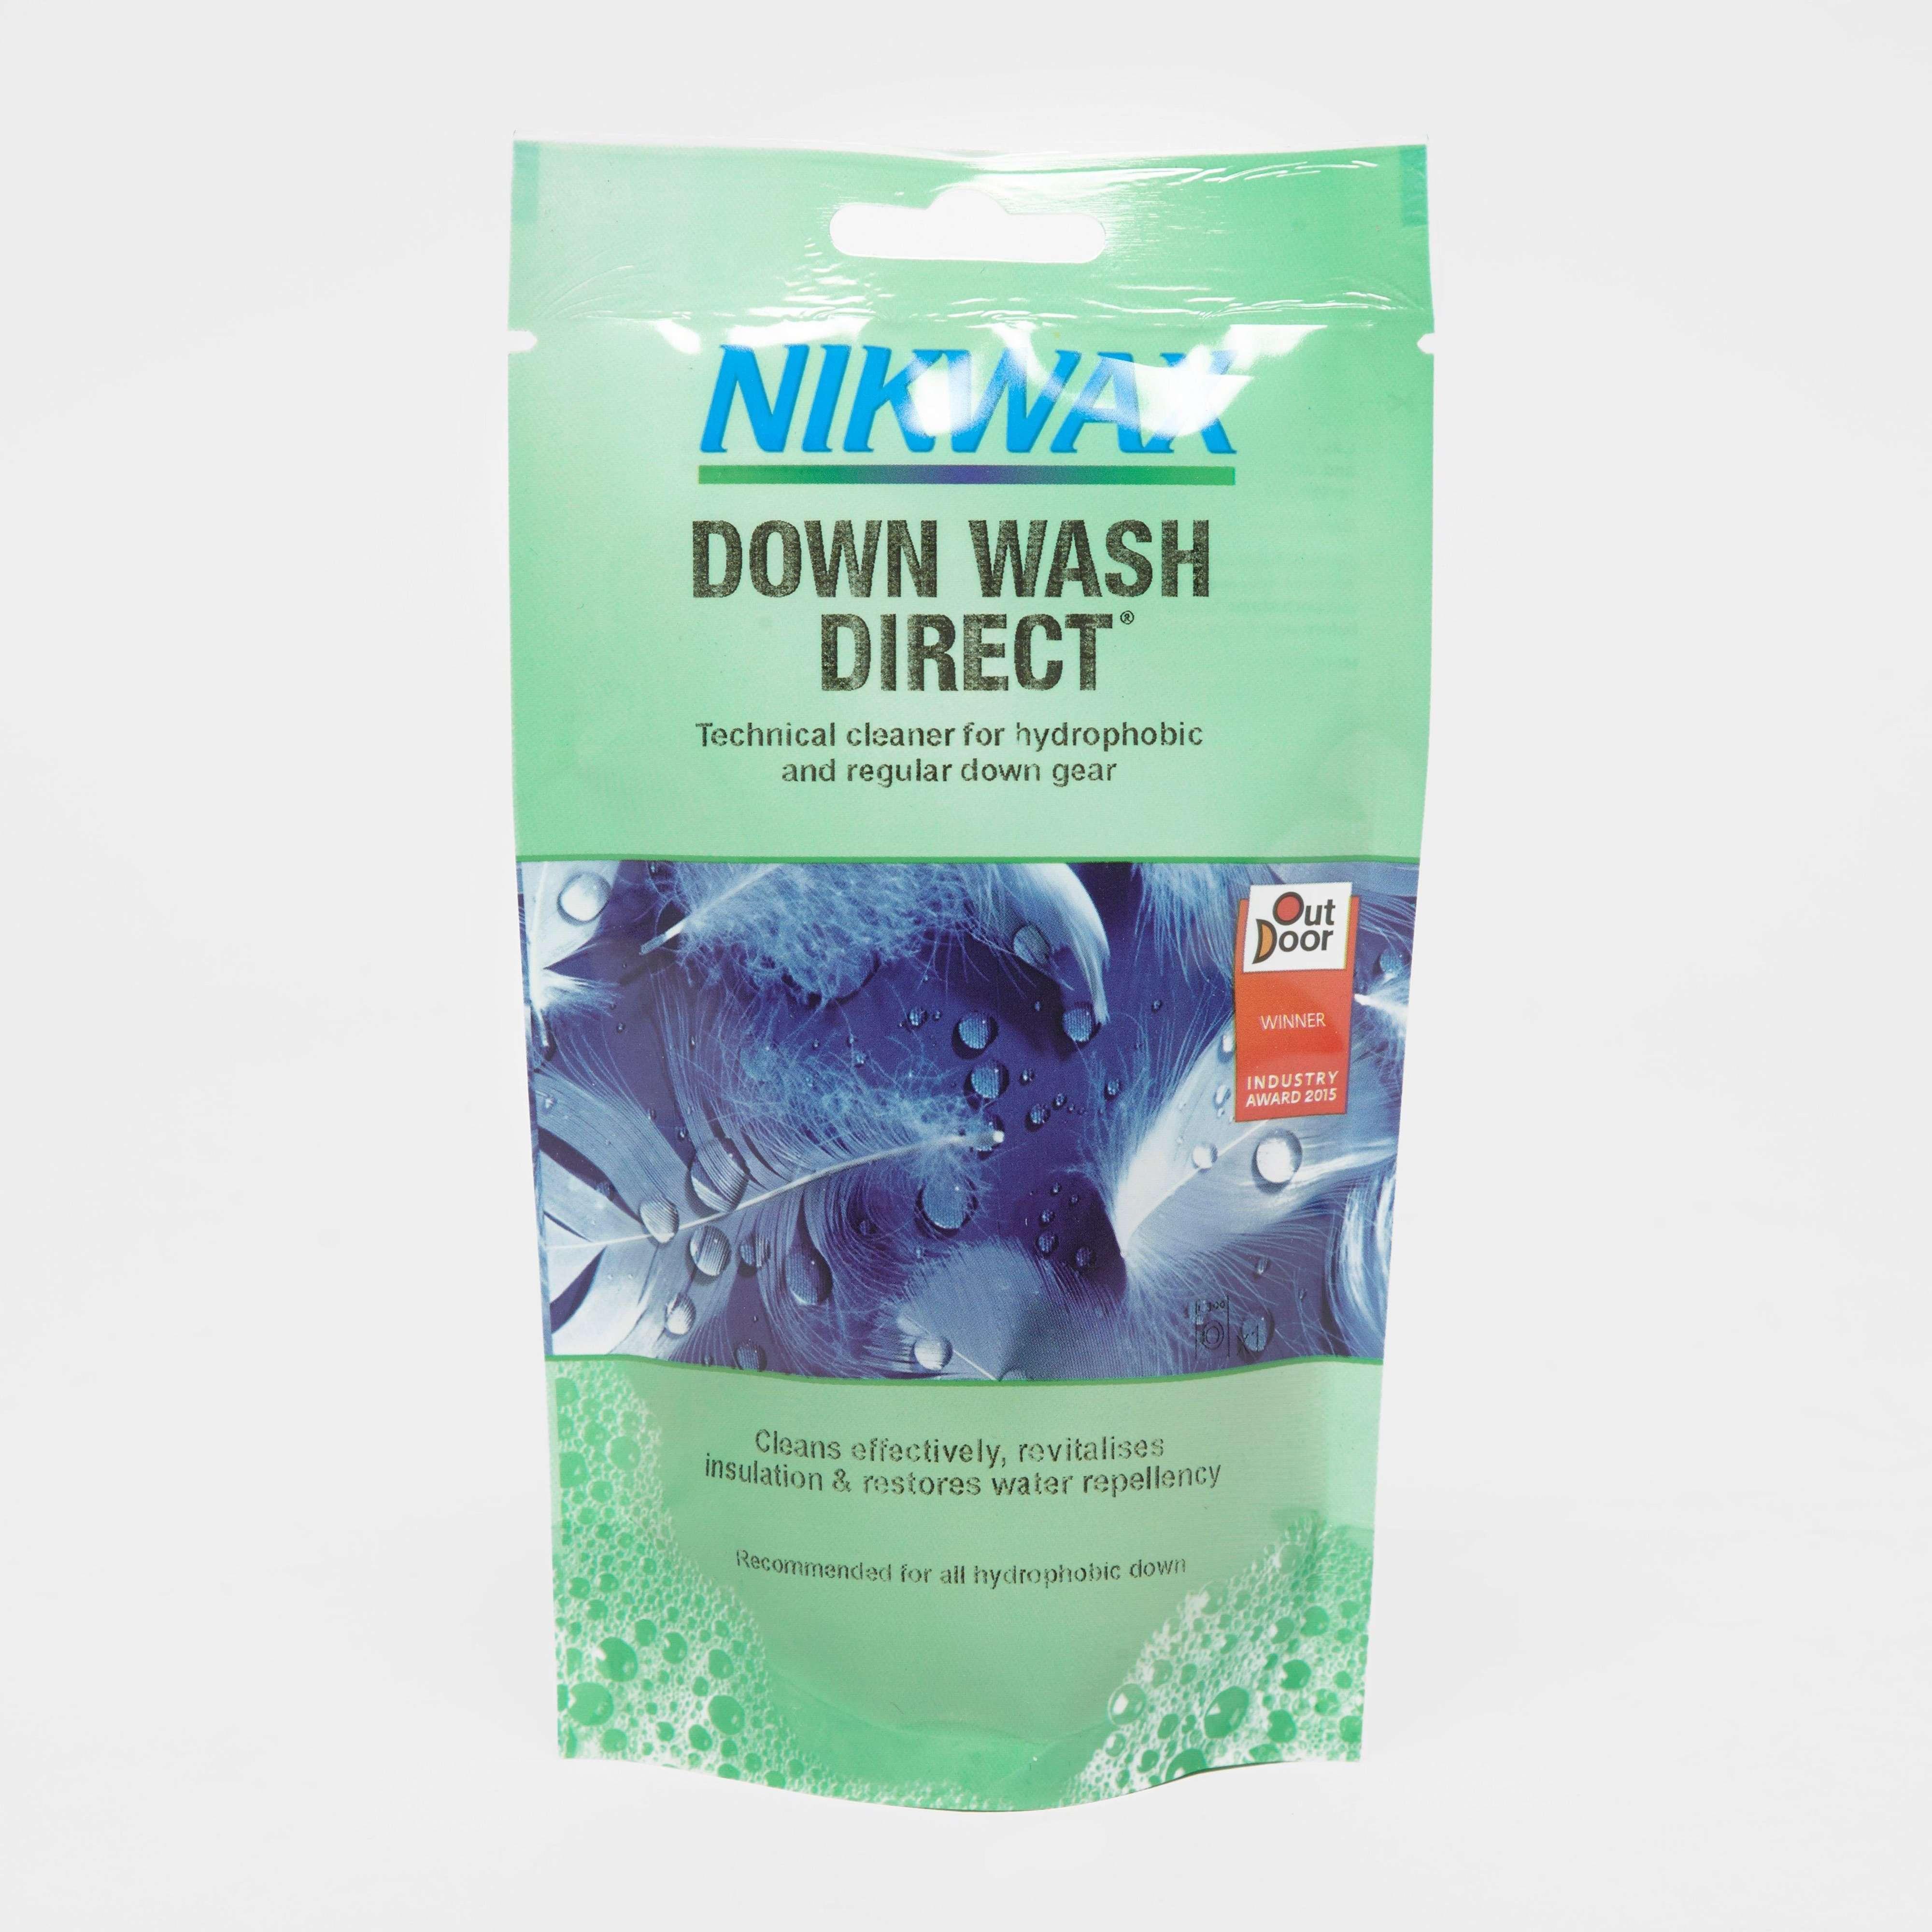 NIKWAX Down Wash Direct 100ml